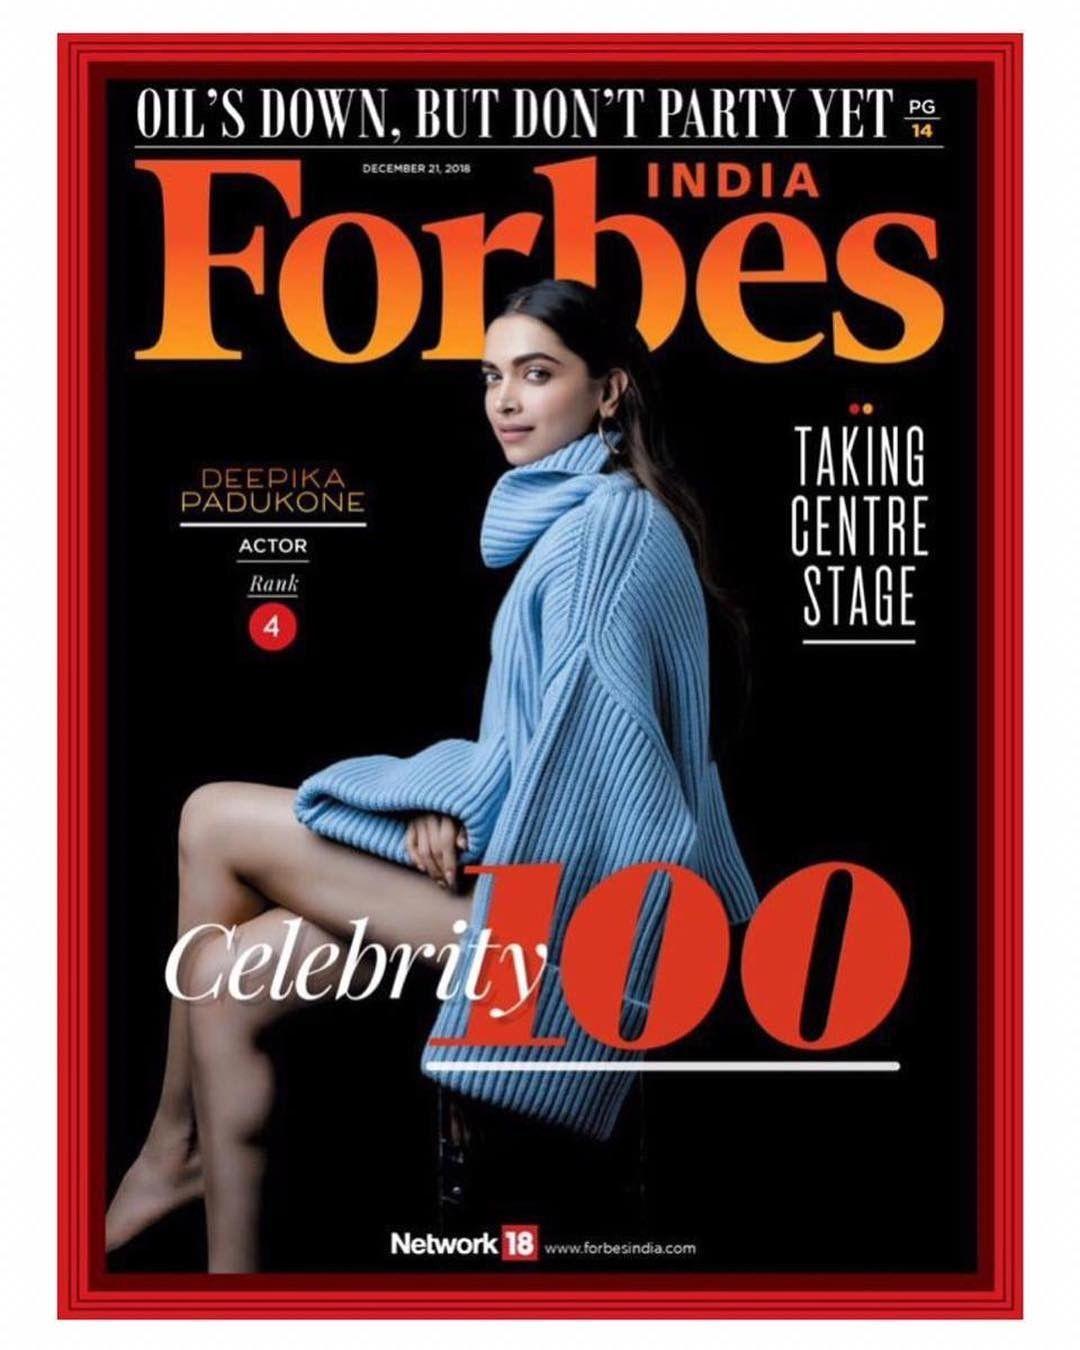 Deepika Padukone In Forbes Cover Capa De Revista Poses Femininas Poses